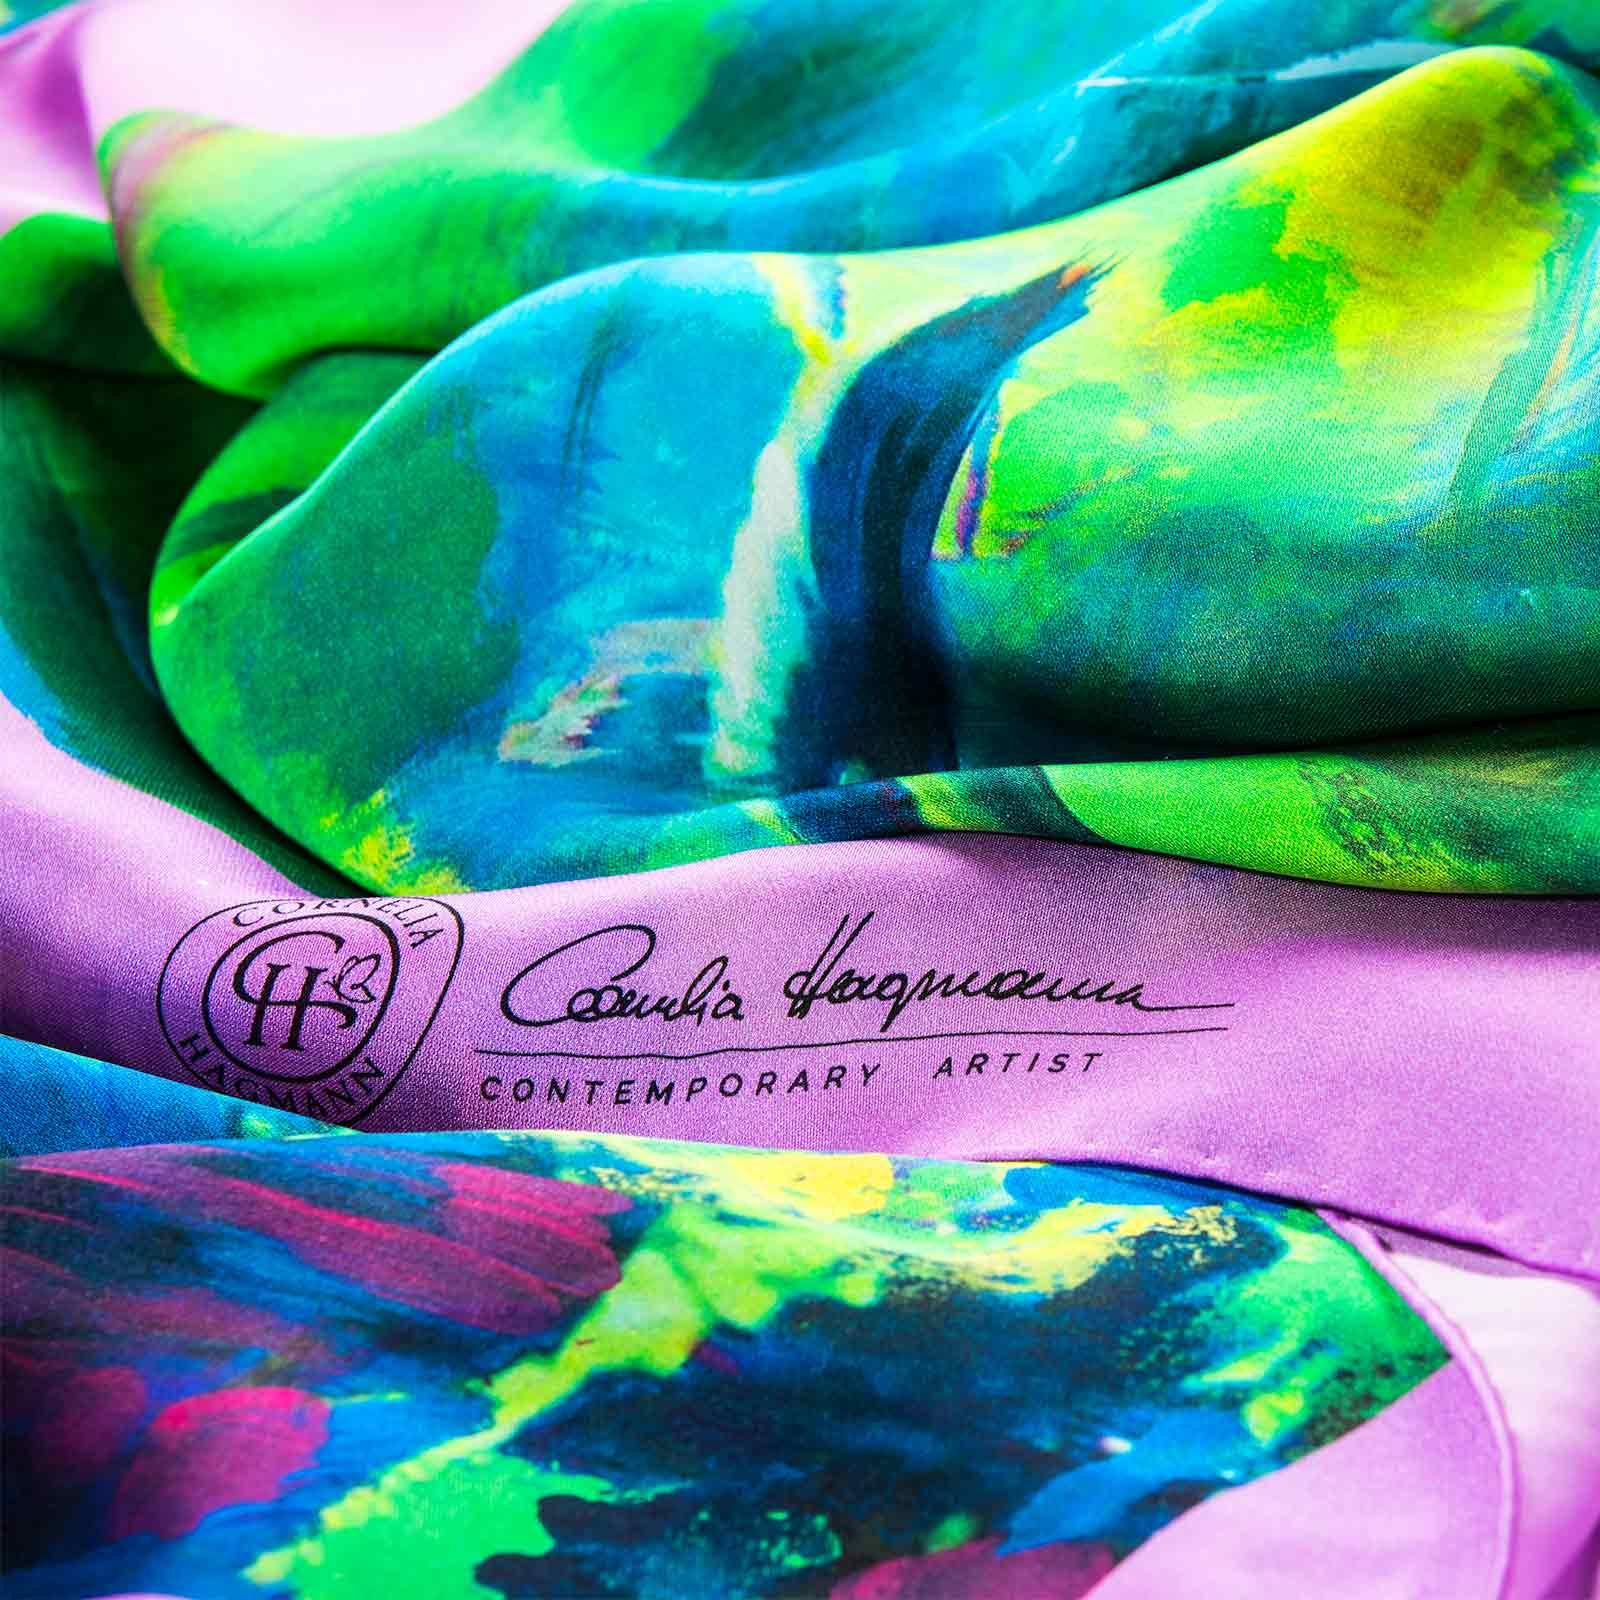 Cornelia Hagmann Contemporary Artist La Galleria Silk Scarf Green Pond Rosee, Seidenschal, sciarpa di seta, foulard soie,